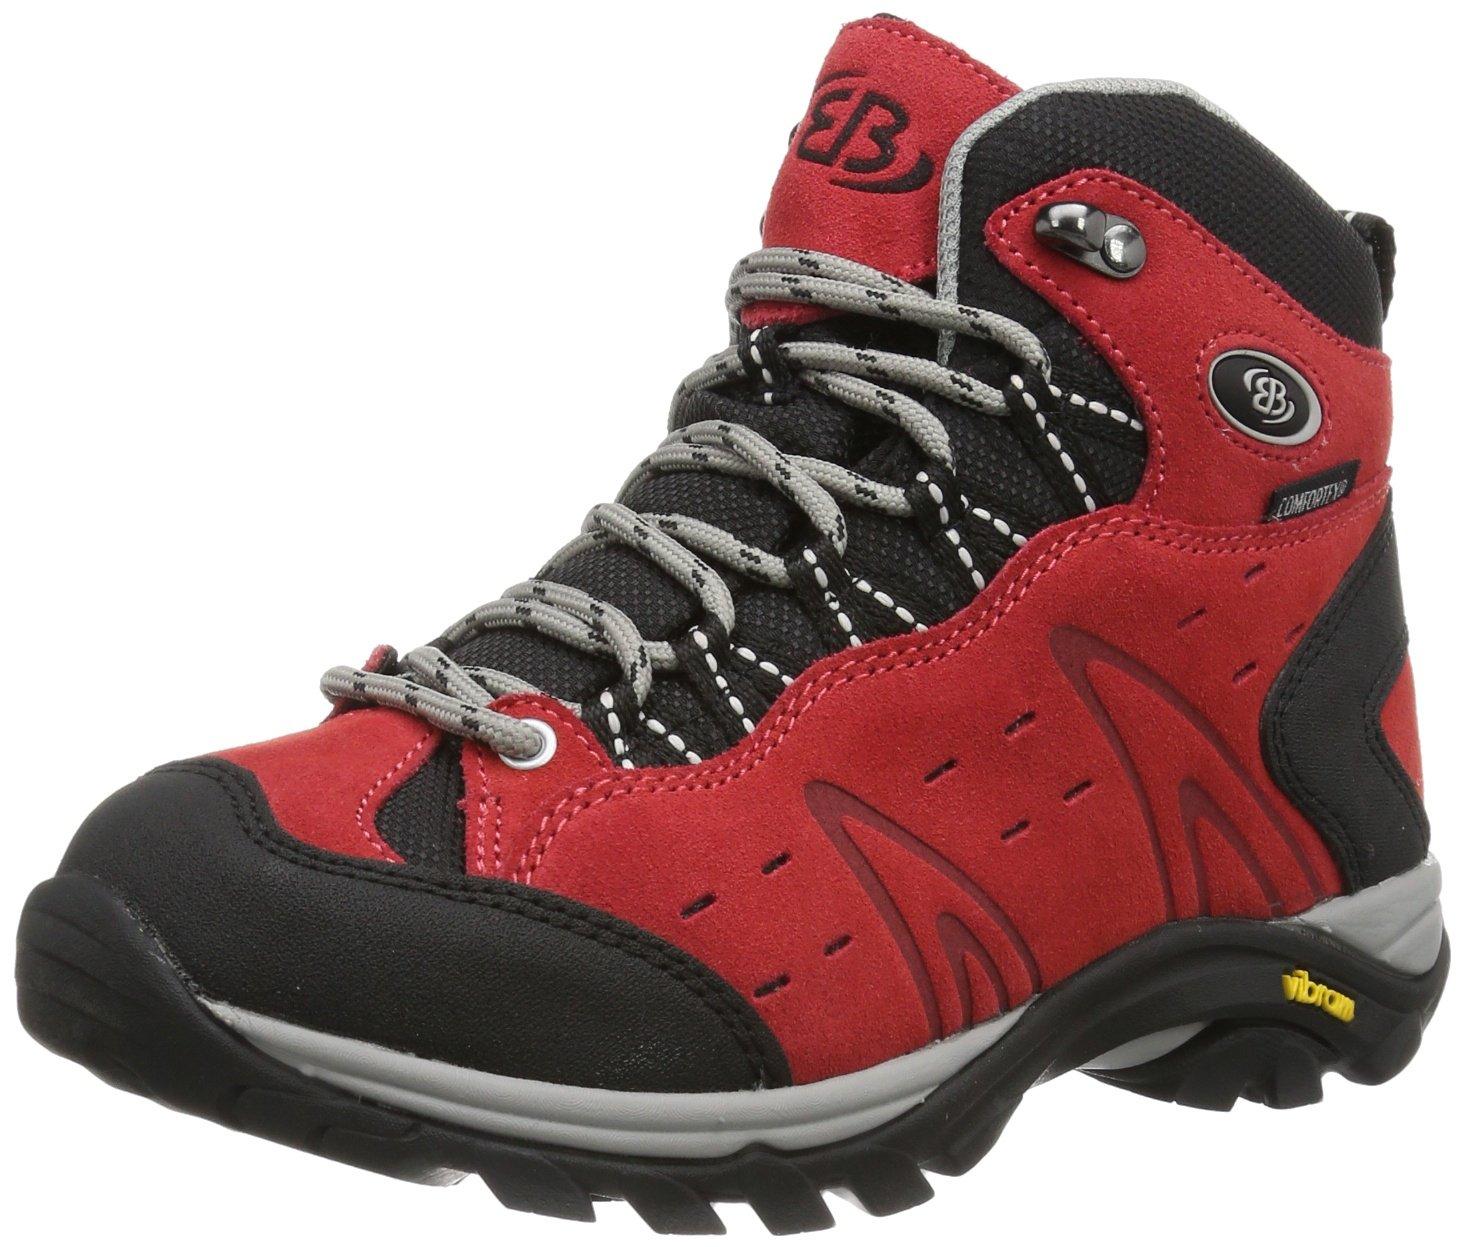 6c386381e4256e Bruetting Damen Mount Bona High Trekking-  Wanderschuhe product image